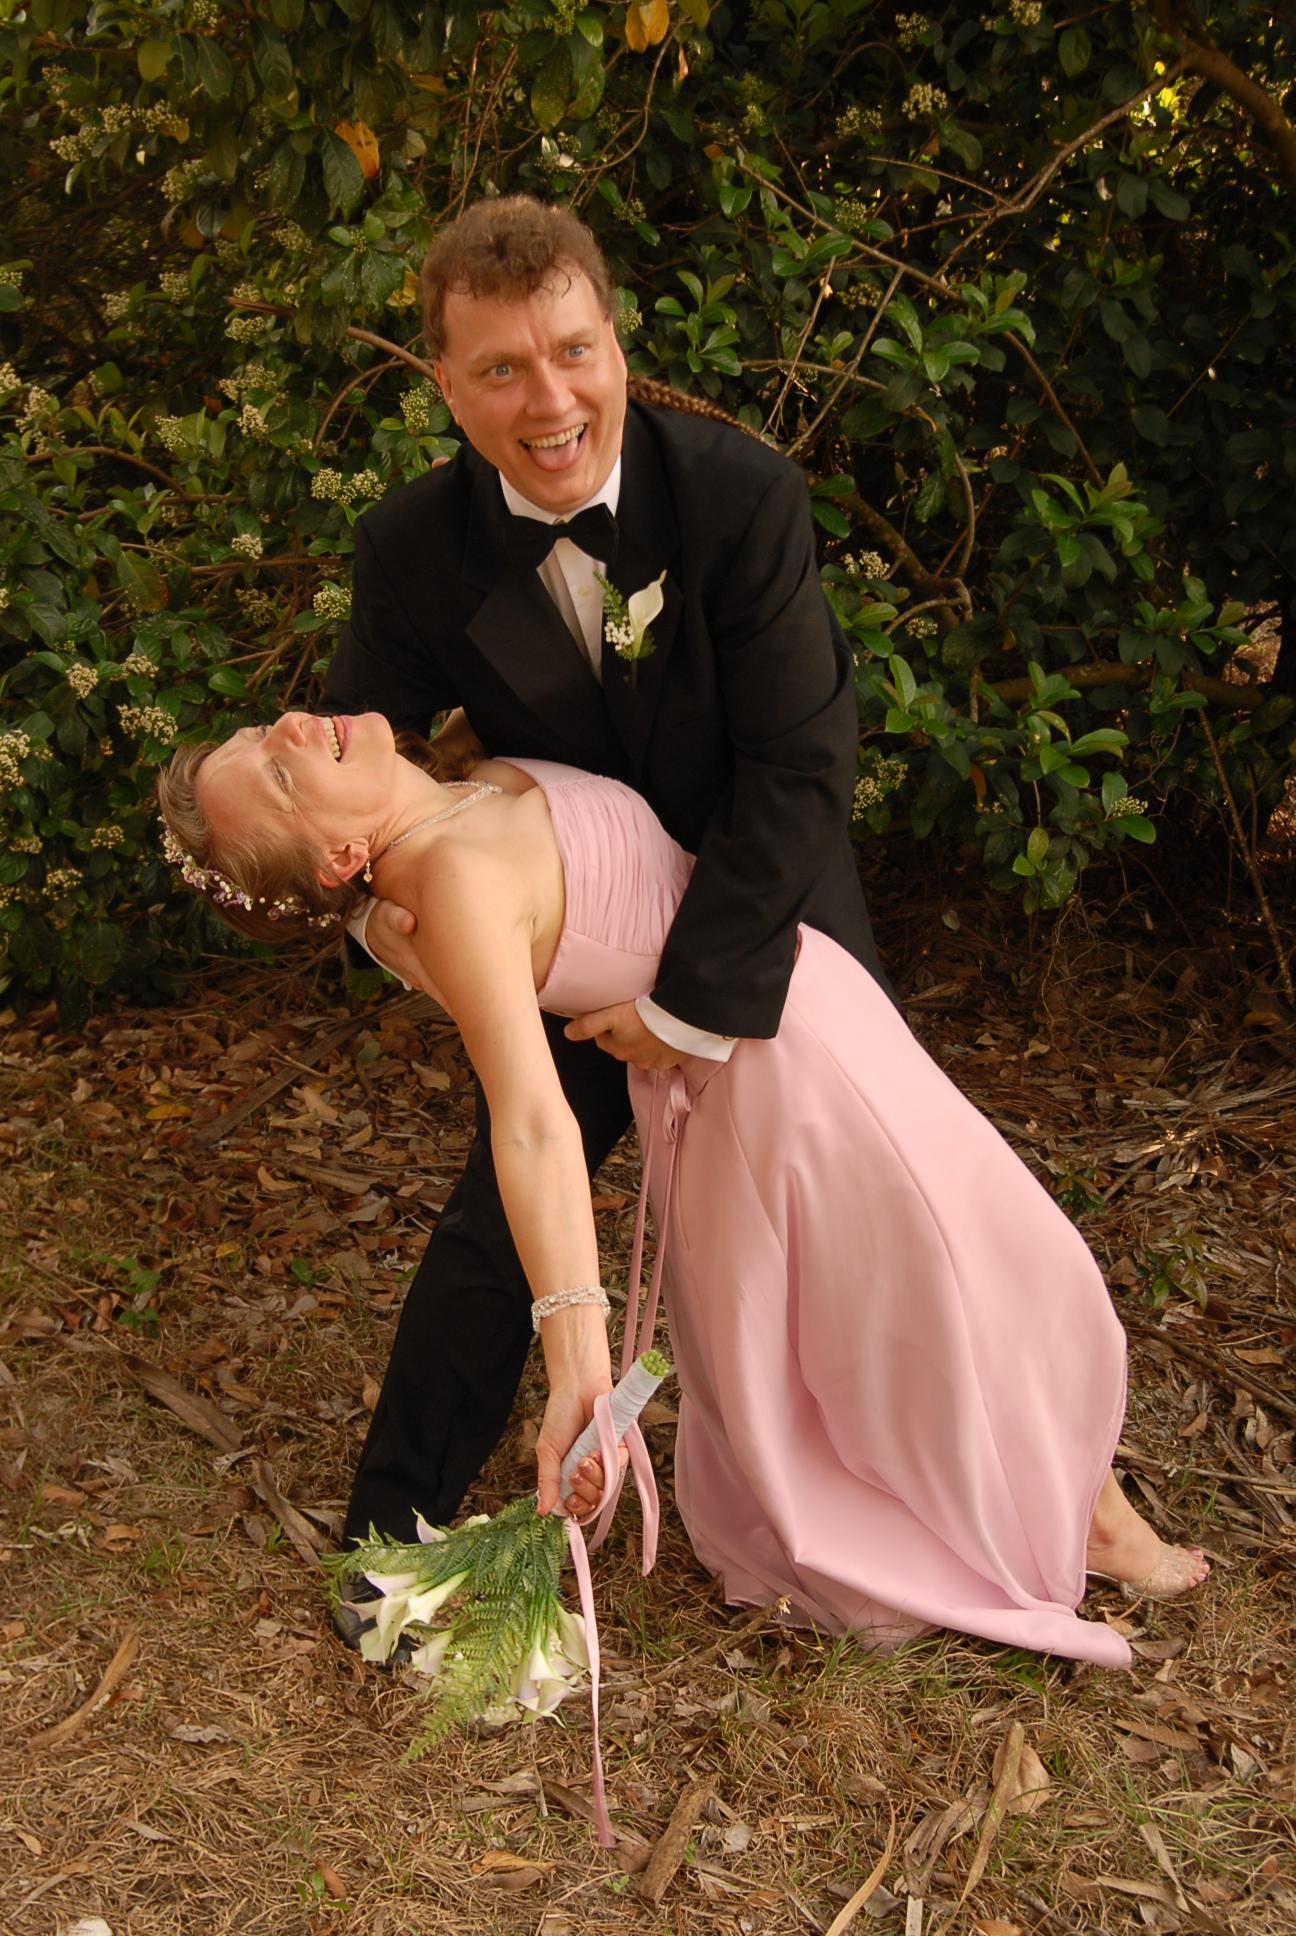 emily-and-travis-4-1-2013-april-fools-wedding-2-322